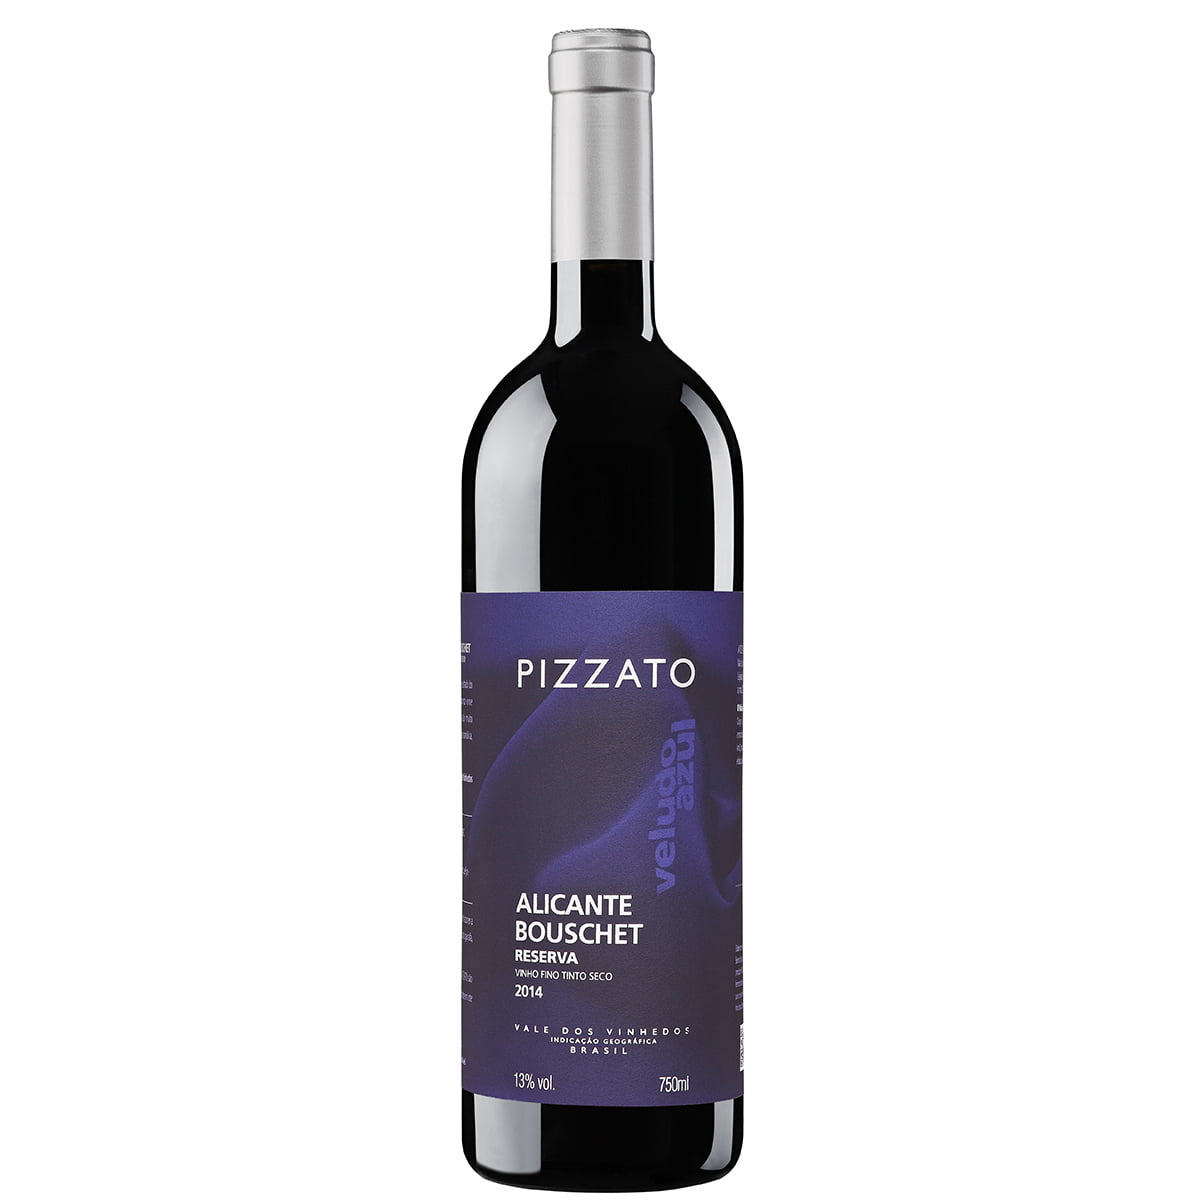 Vinho Tinto Pizzato Alicante Bouschet Reserva 750ml